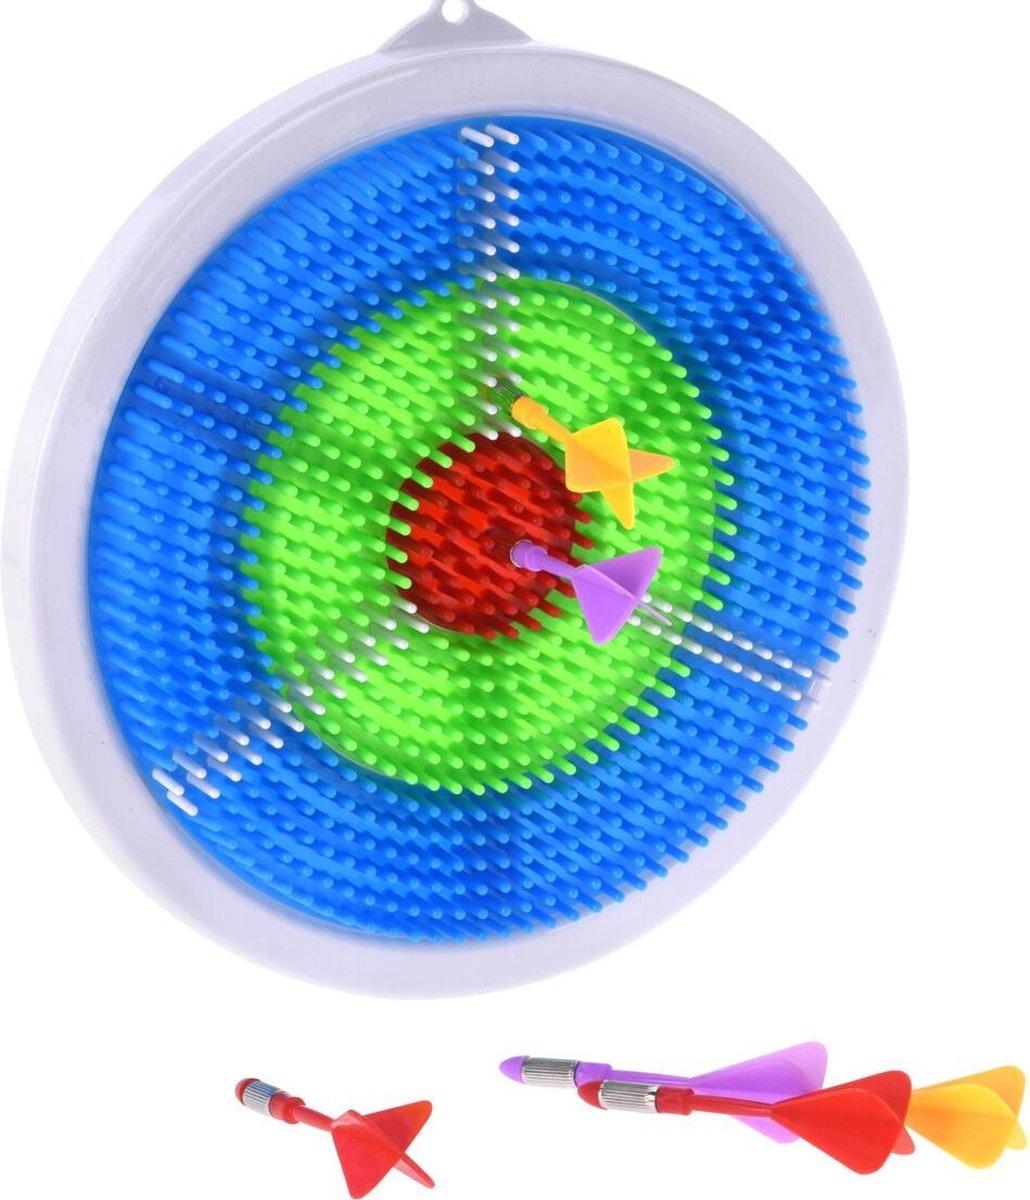 Free And Easy Dartbordset Junior 23,5 Cm Wit/blauw 7-delig